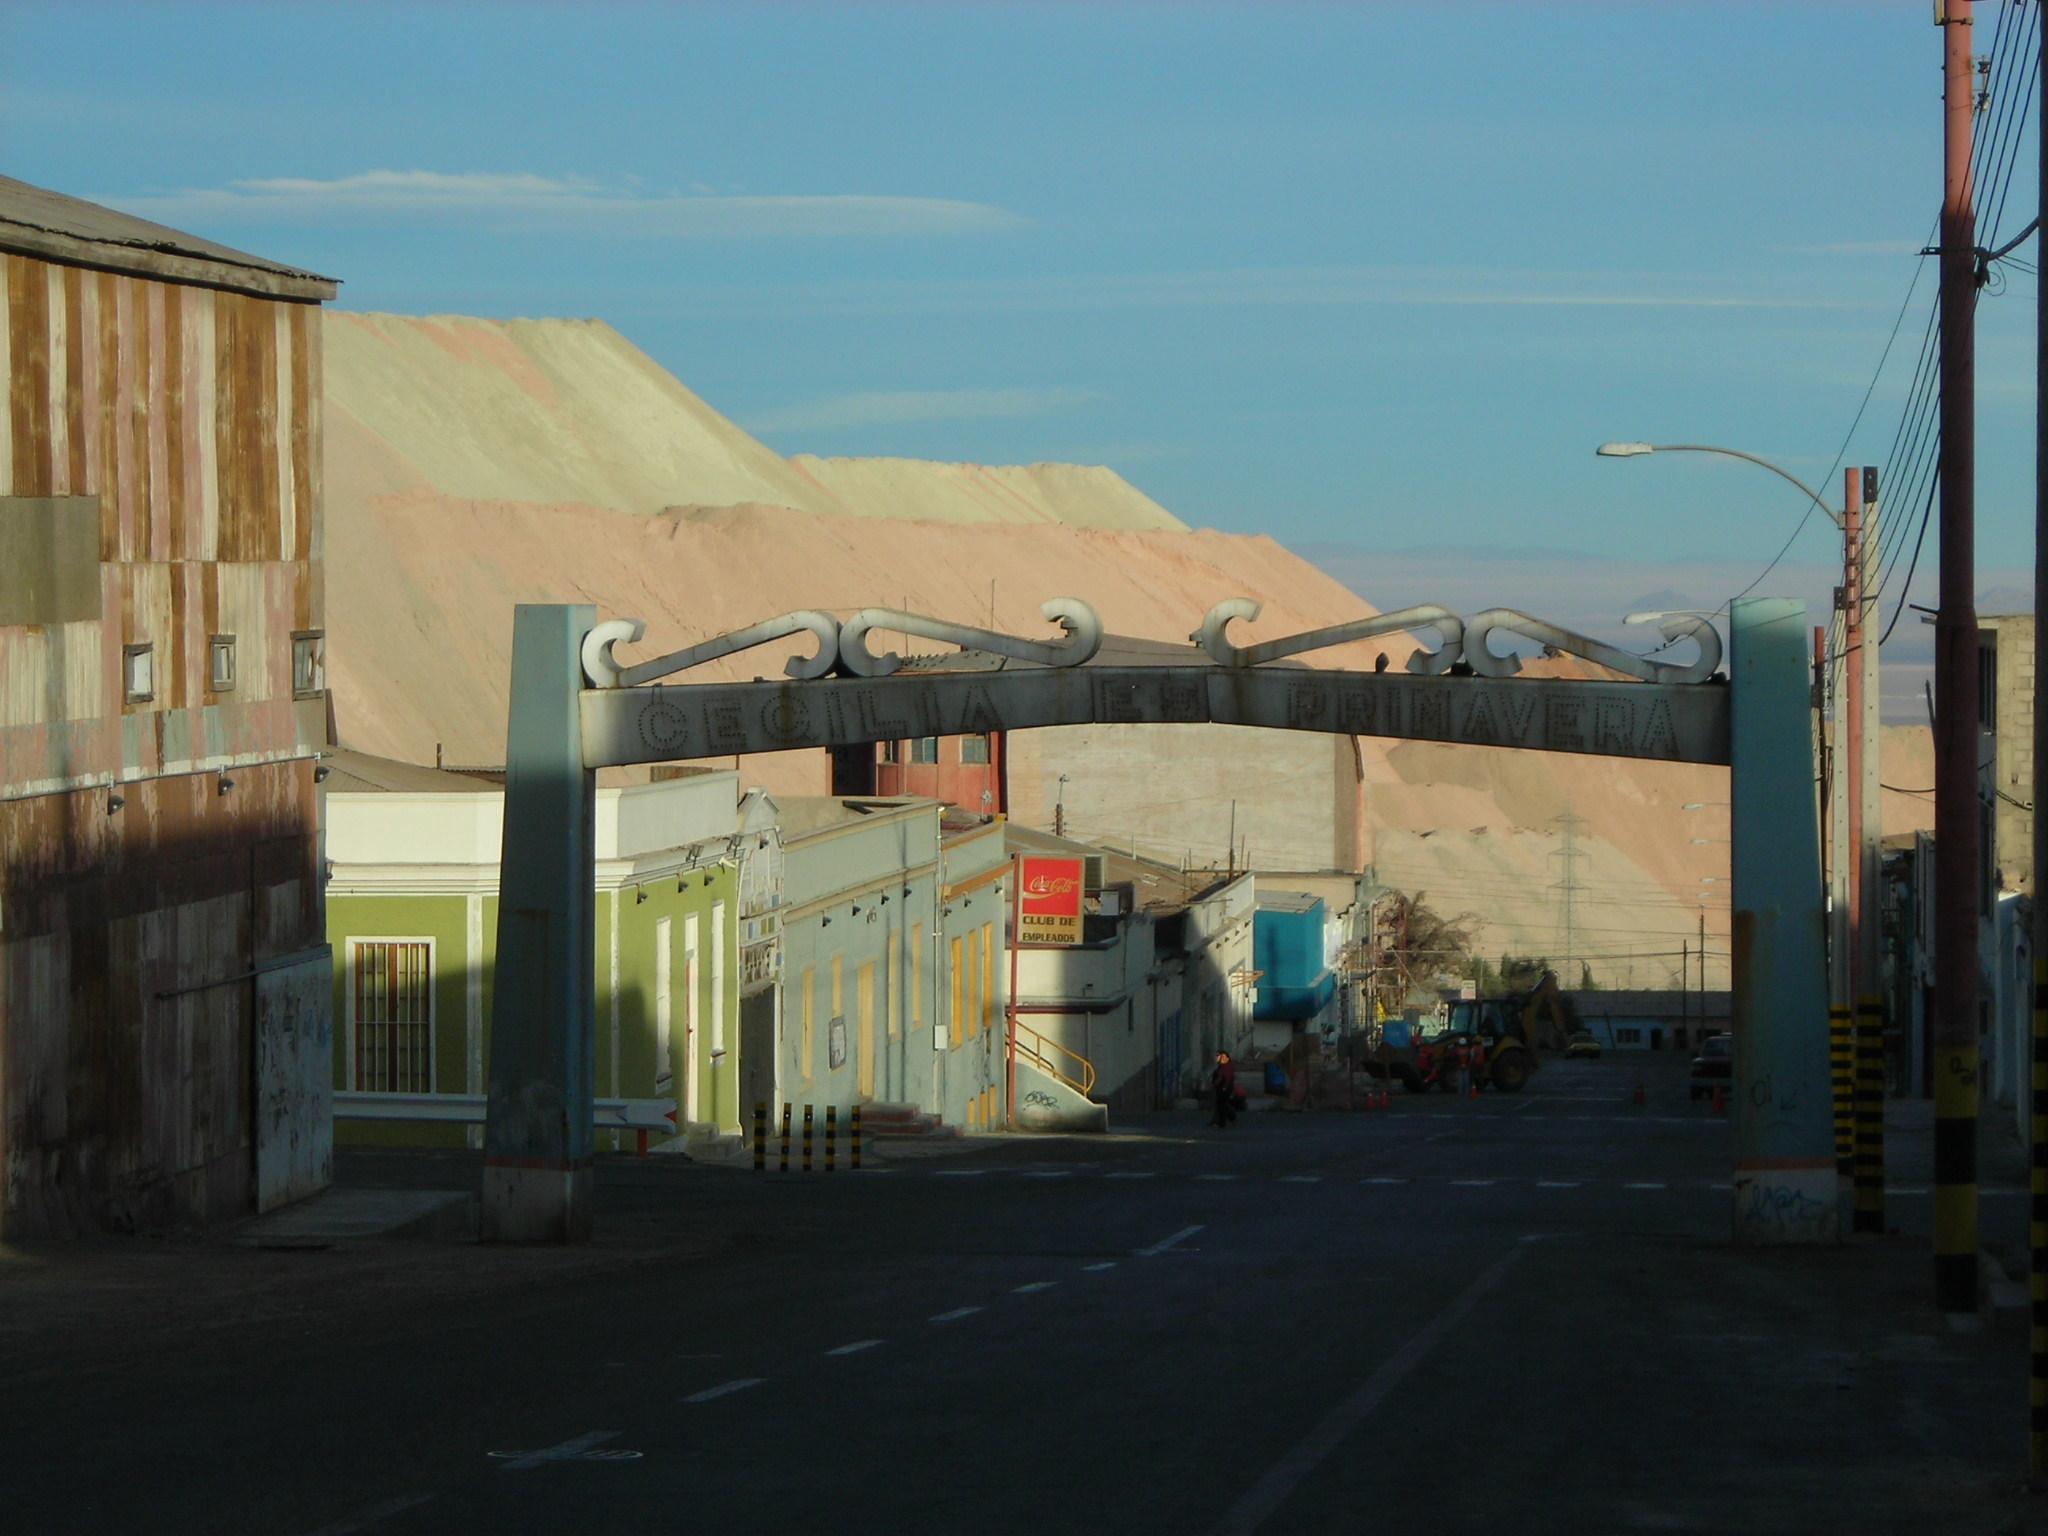 Chuquicamata: patrimonio arquitectónico que busca sobrevivir